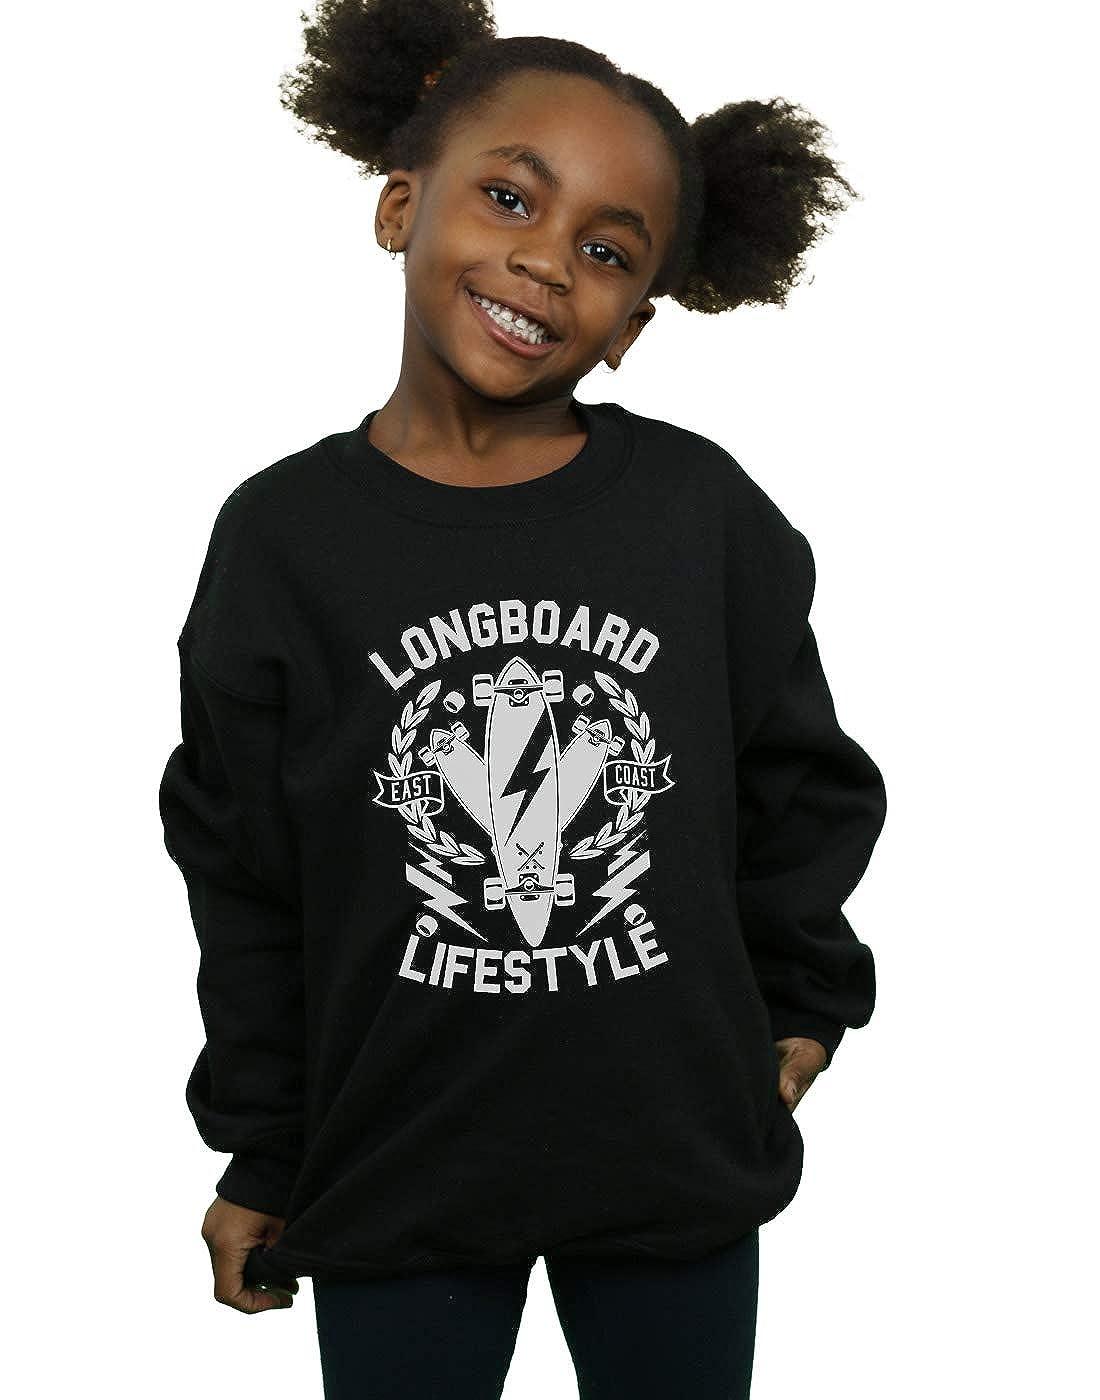 Drewbacca Girls Longboard Lifestyle Sweatshirt